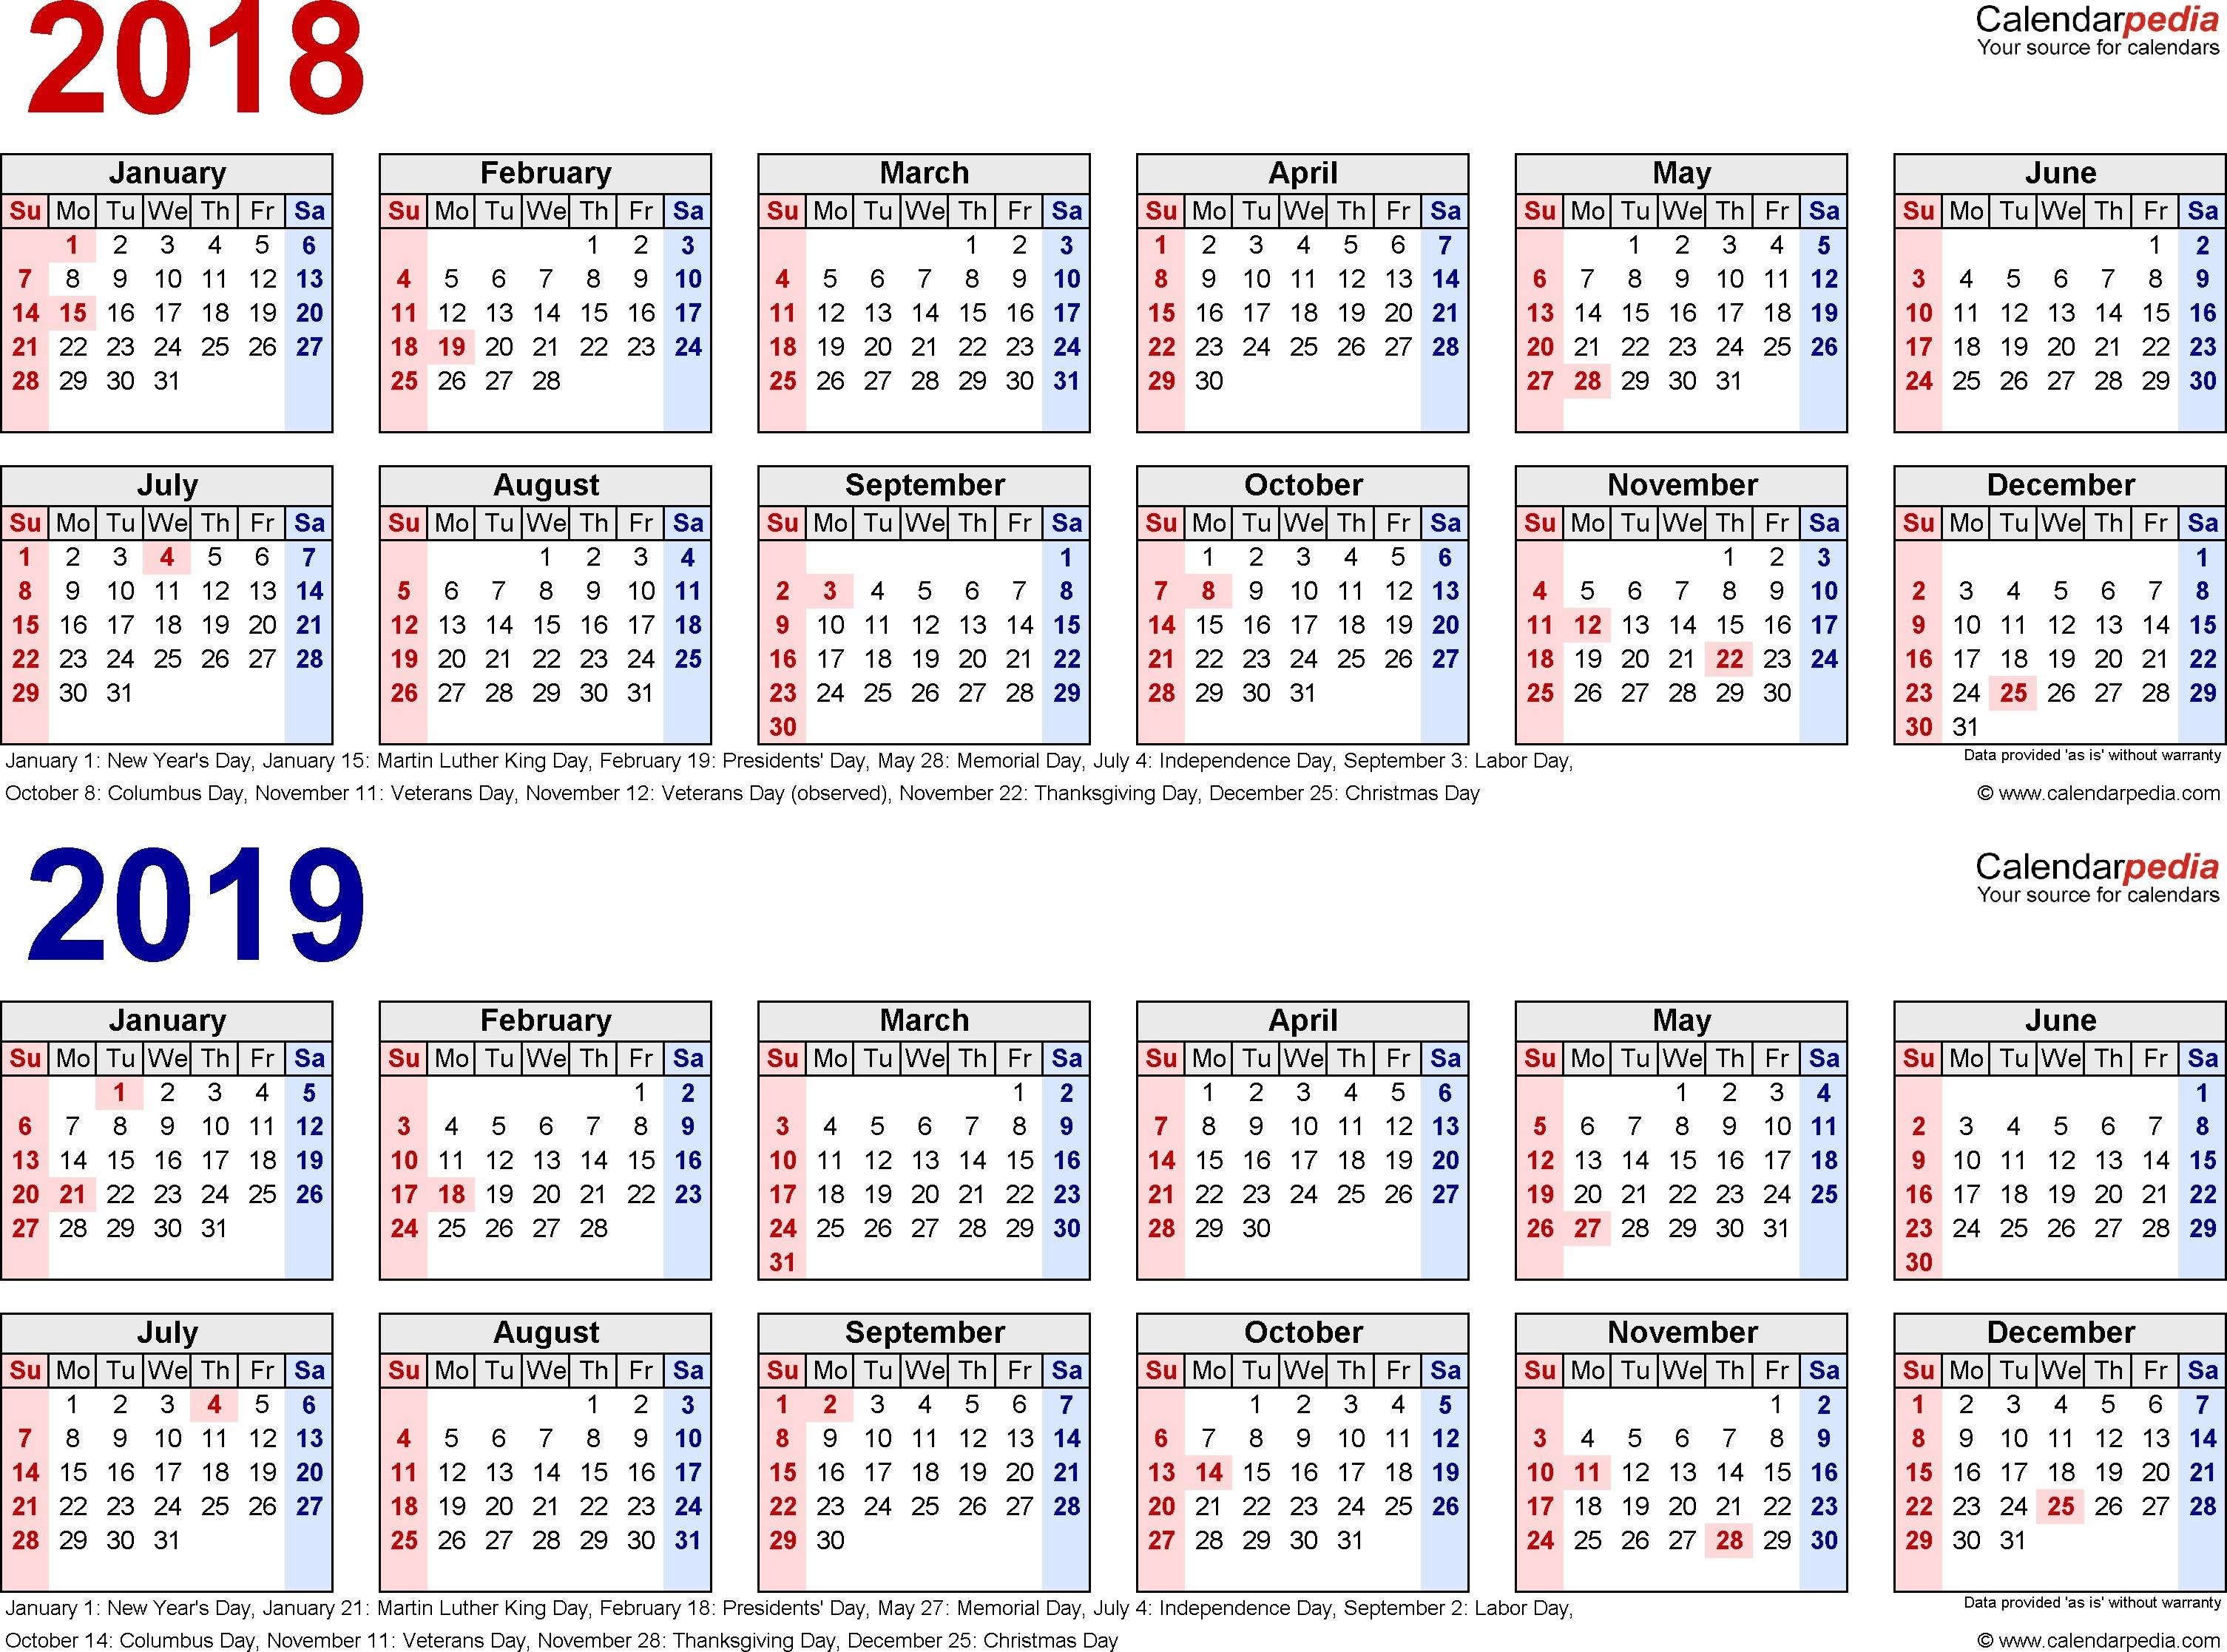 2018 2019 calendar free printable two year excel calendars